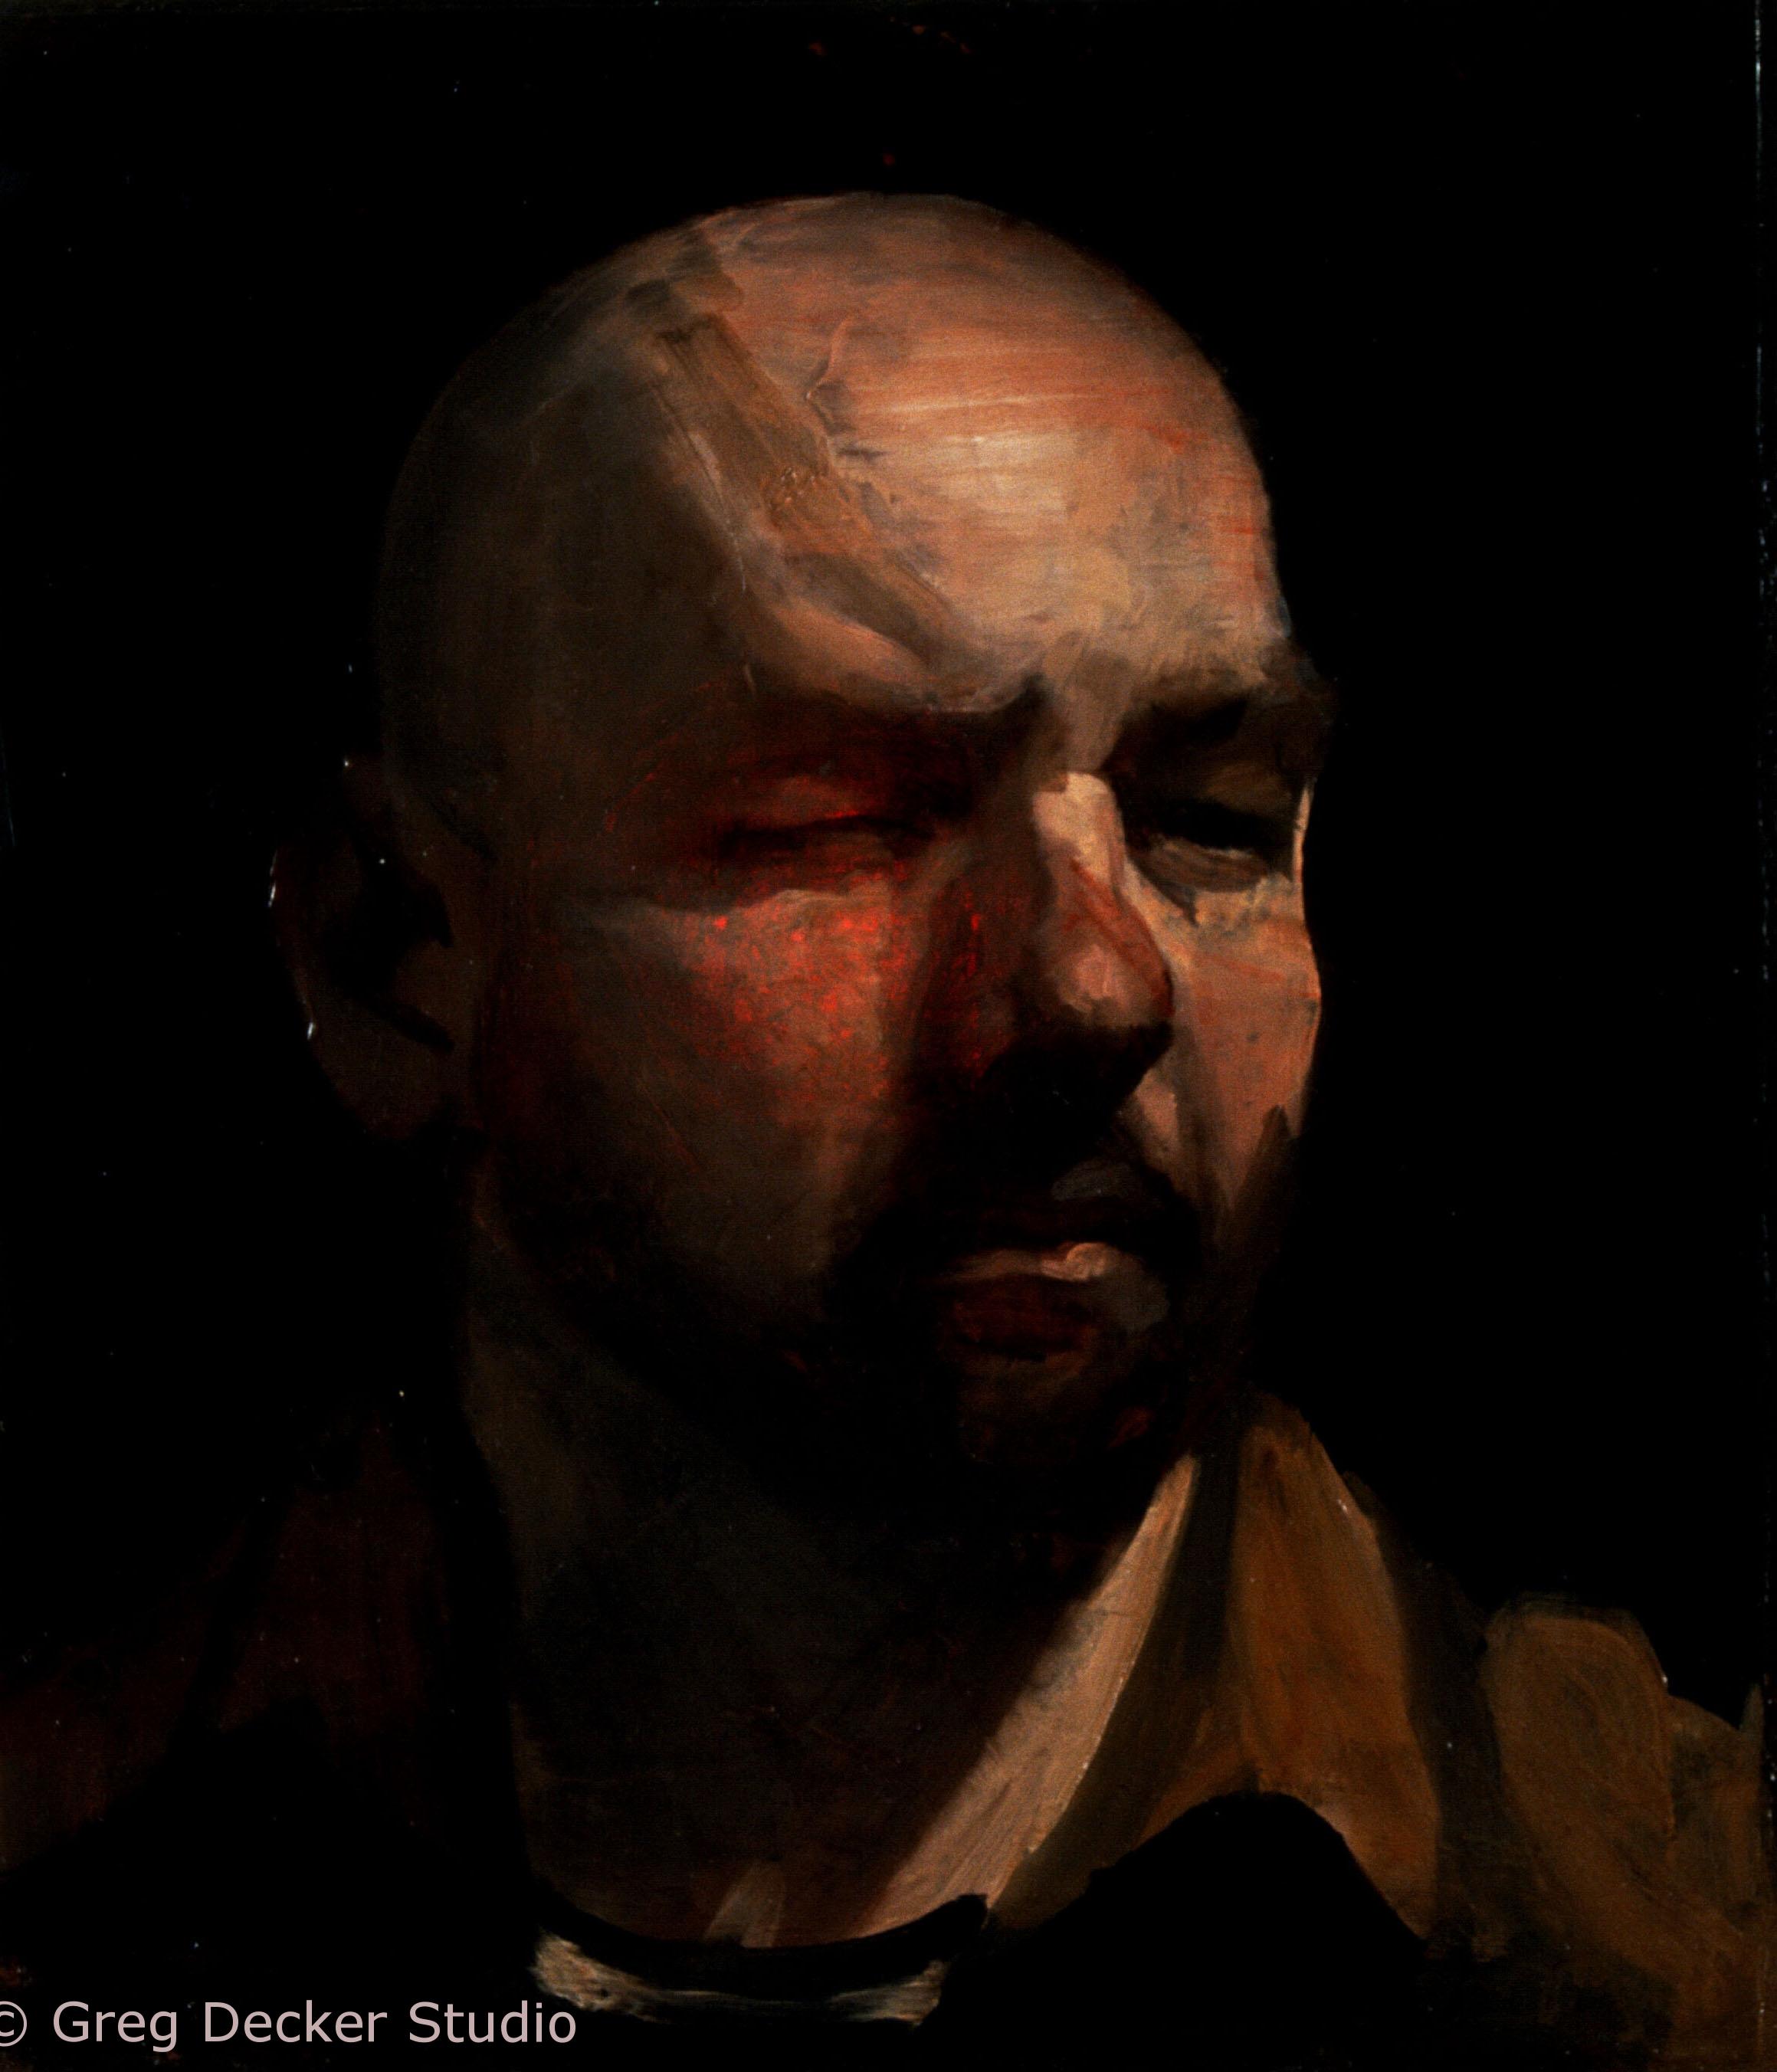 Self-Portrait (One Eye Closed)